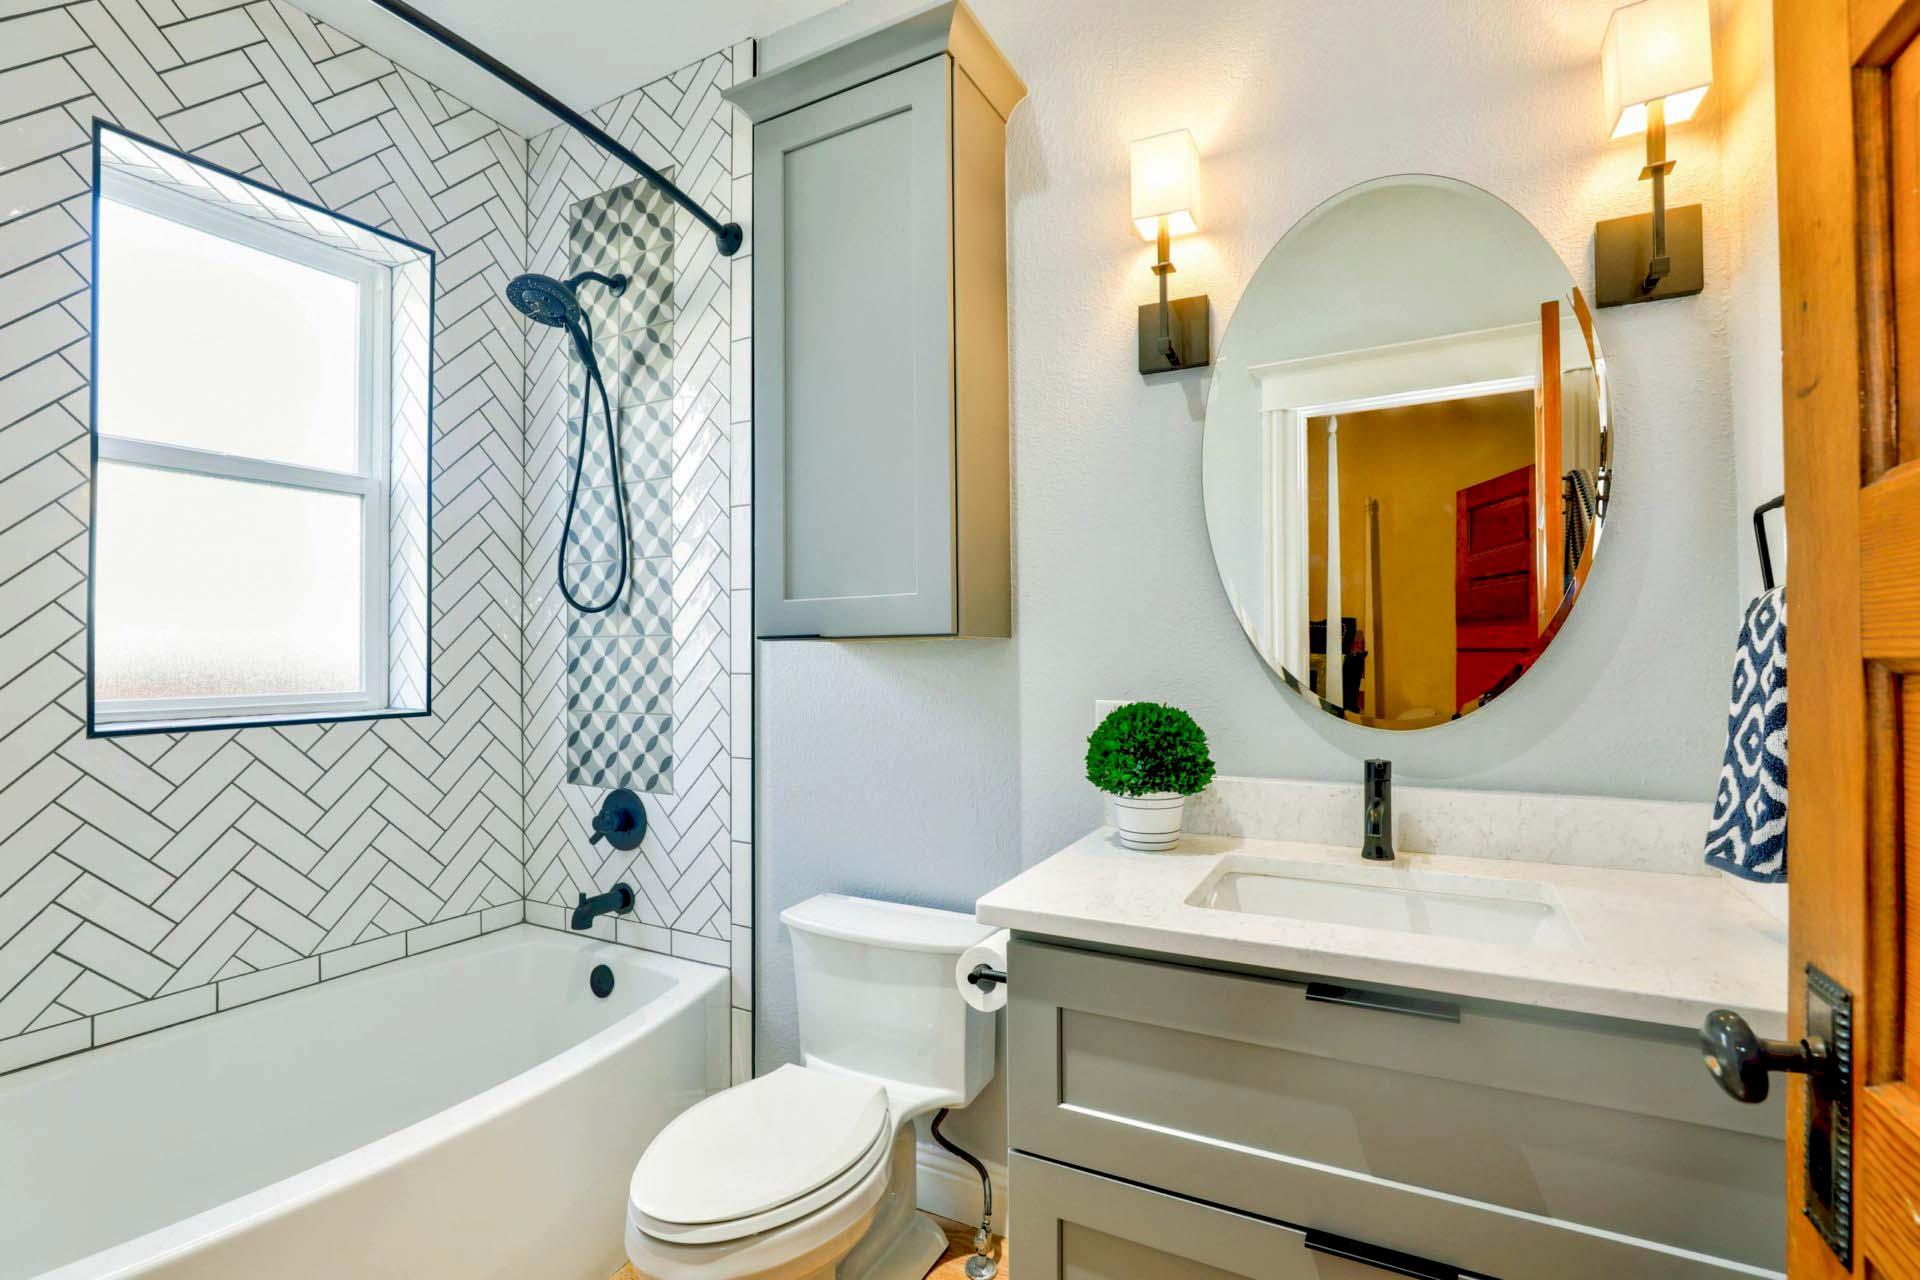 Warna keramik kamar mandi yang cerah minimalis